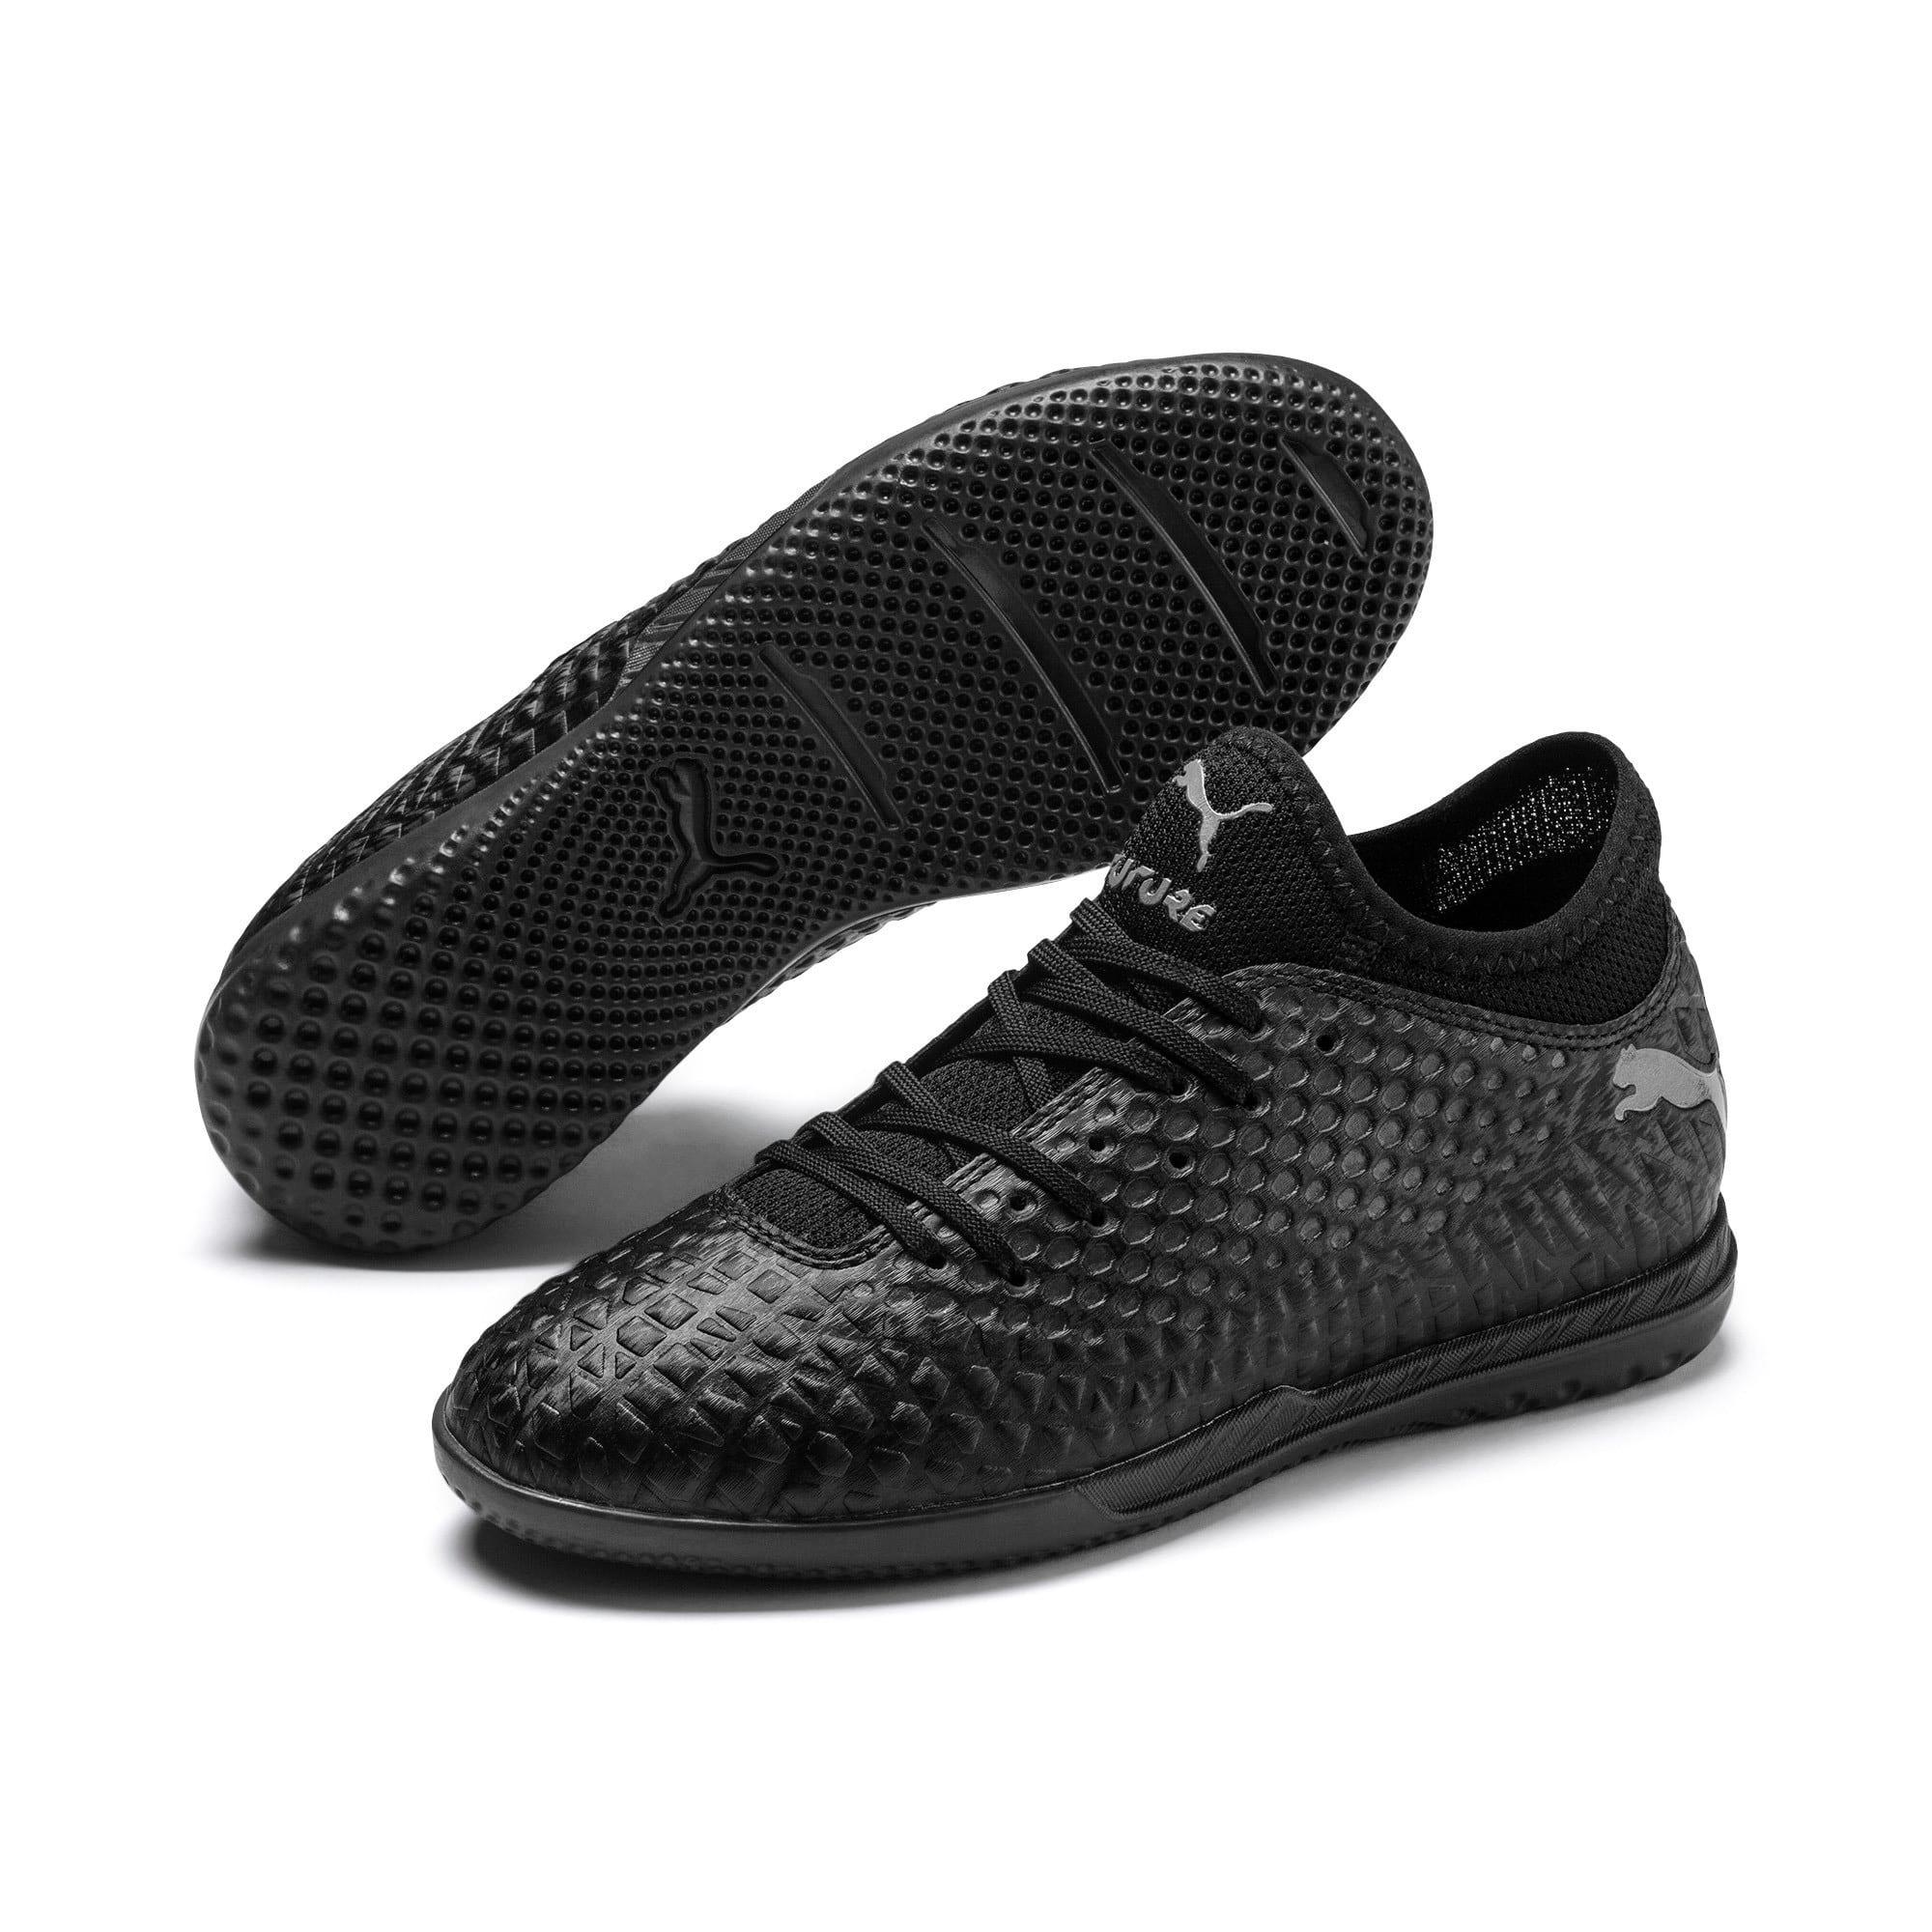 Thumbnail 2 of Chaussure de foot FUTURE 4.4 IT Youth, Black-Black-Puma Aged Silver, medium